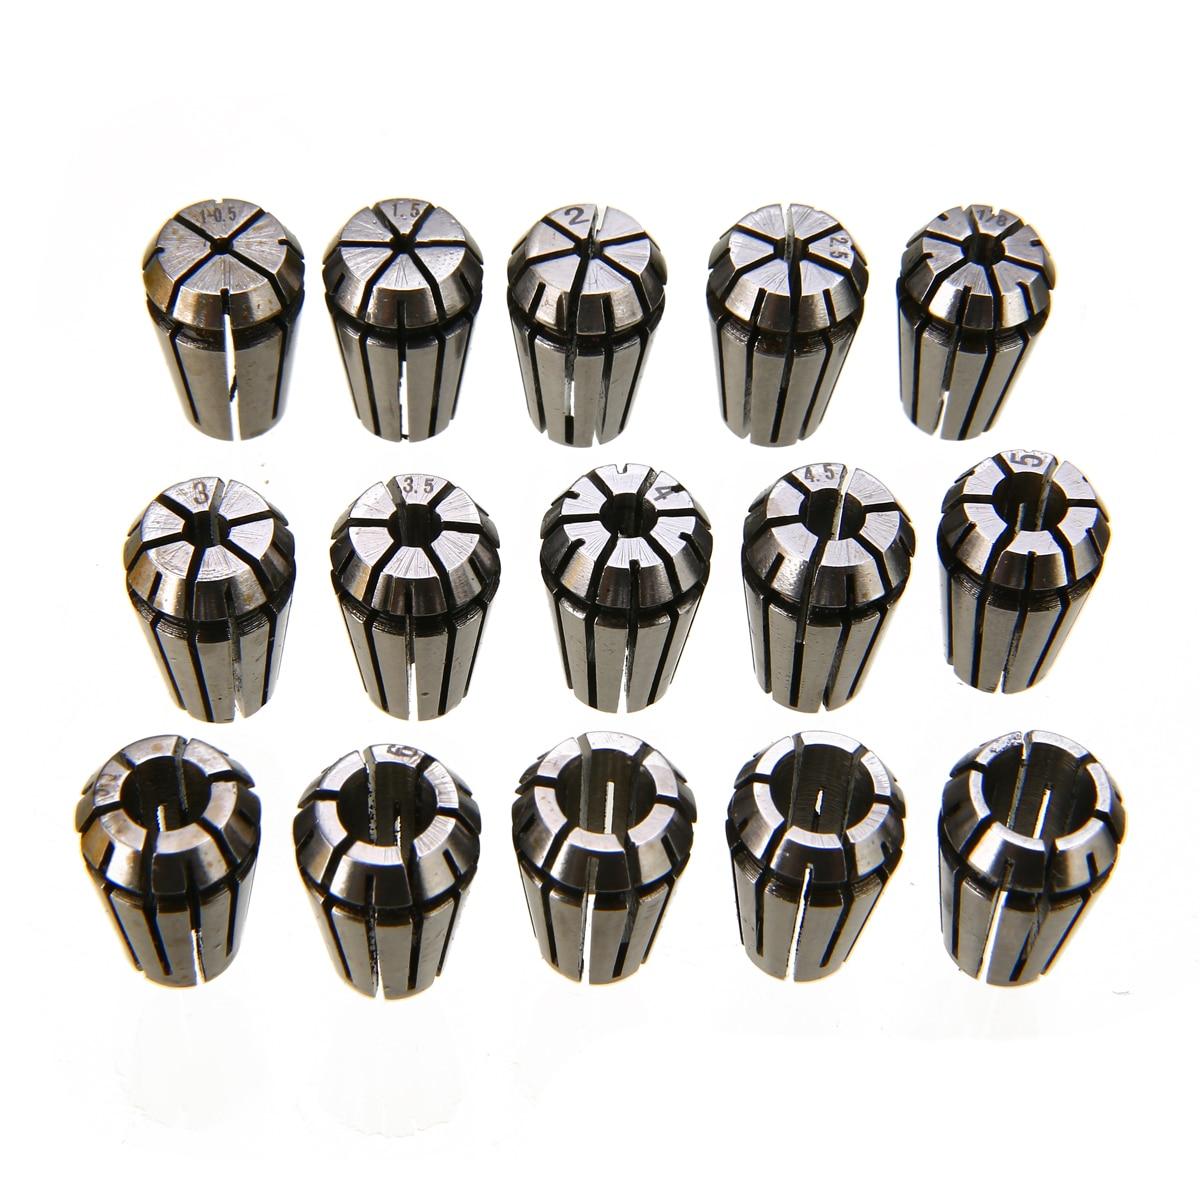 ER11 1-7mm Precision Spring Collet Set CNC Milling Lathe Tool Workholding New